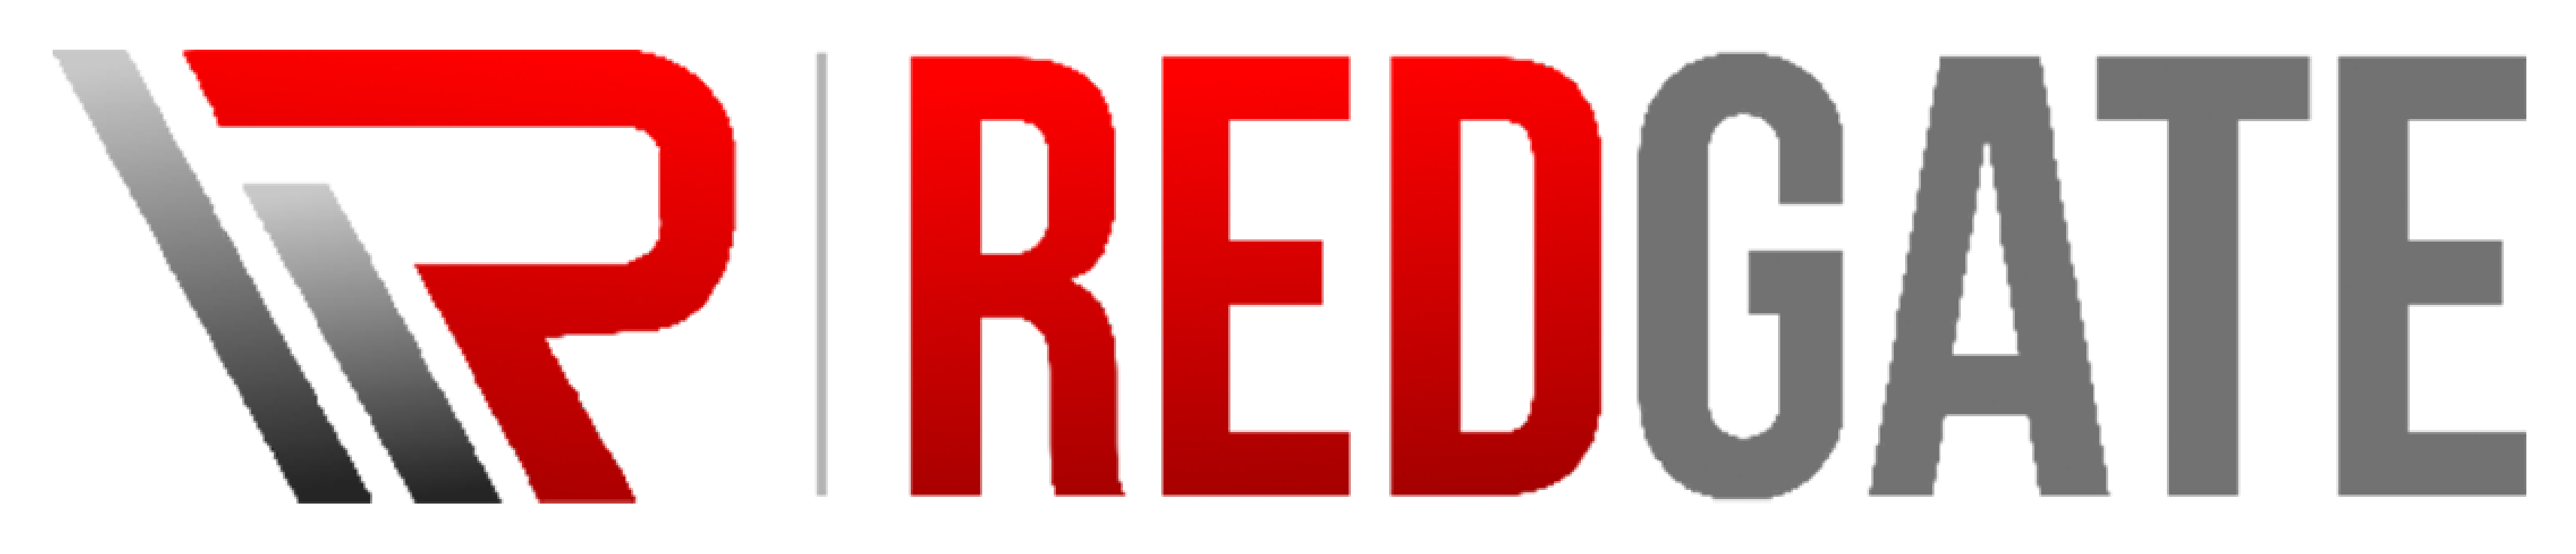 Redgate / Ankara Reklam Marketi